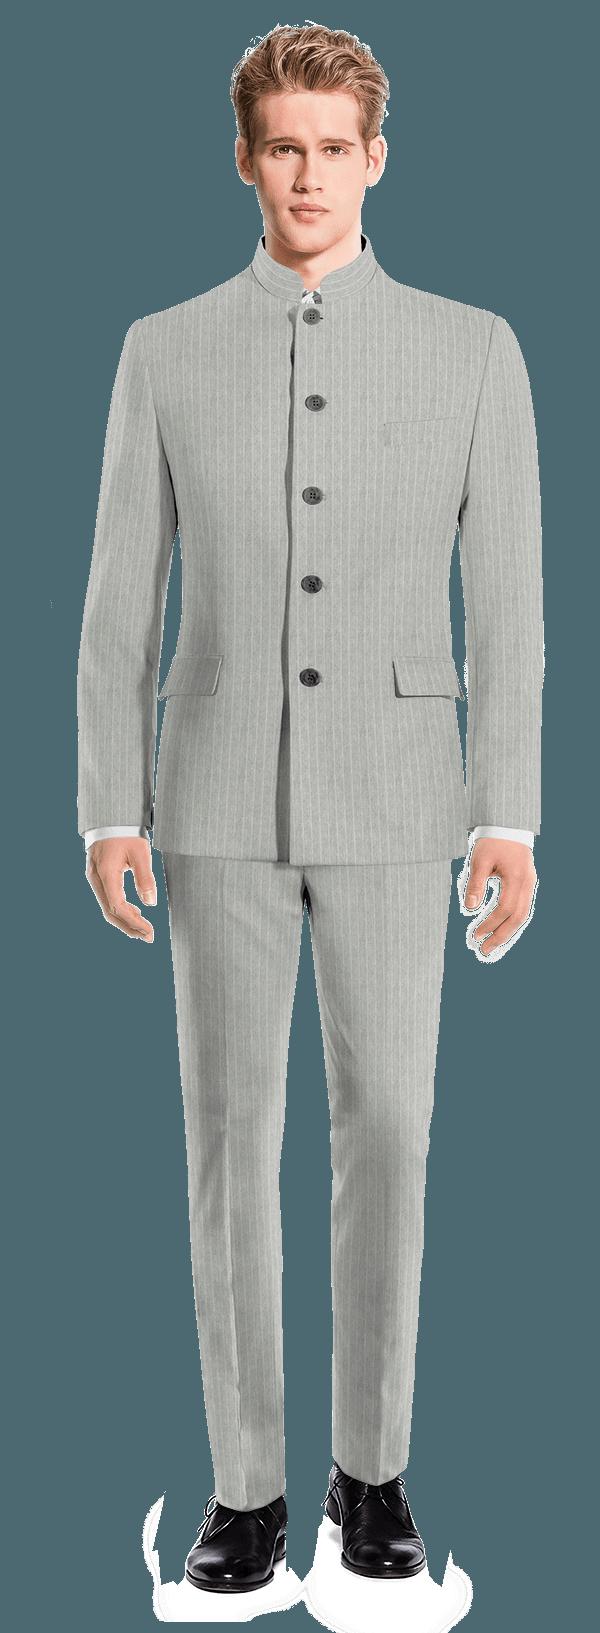 Grey Mao striped linen Suit